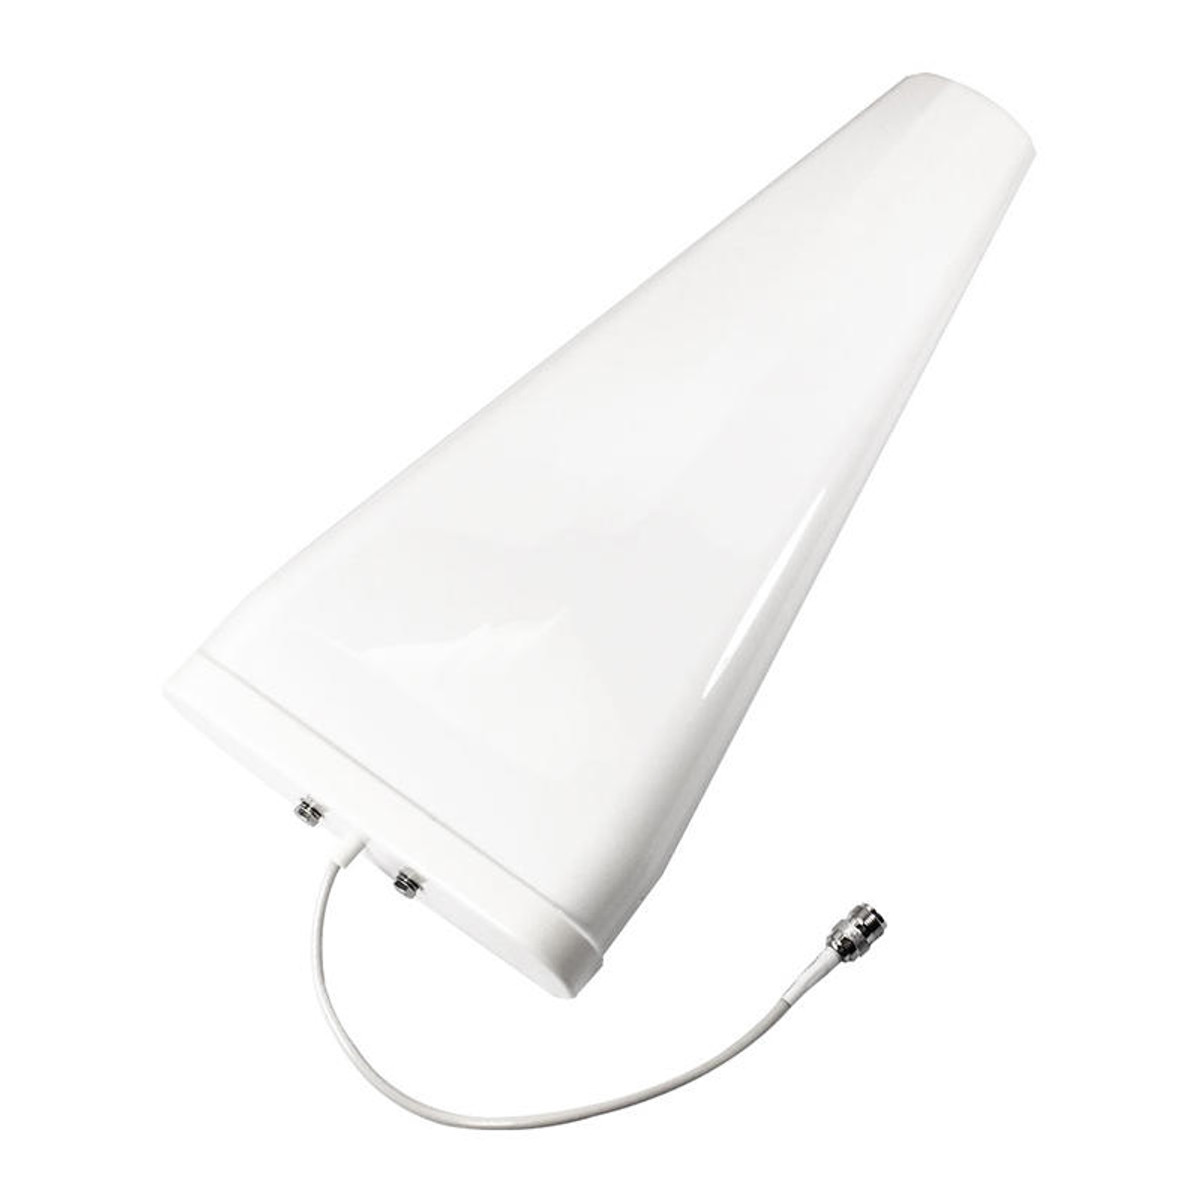 SureCall SureCall Full-Band Yagi Antenna 50 Ohm or SC-230W